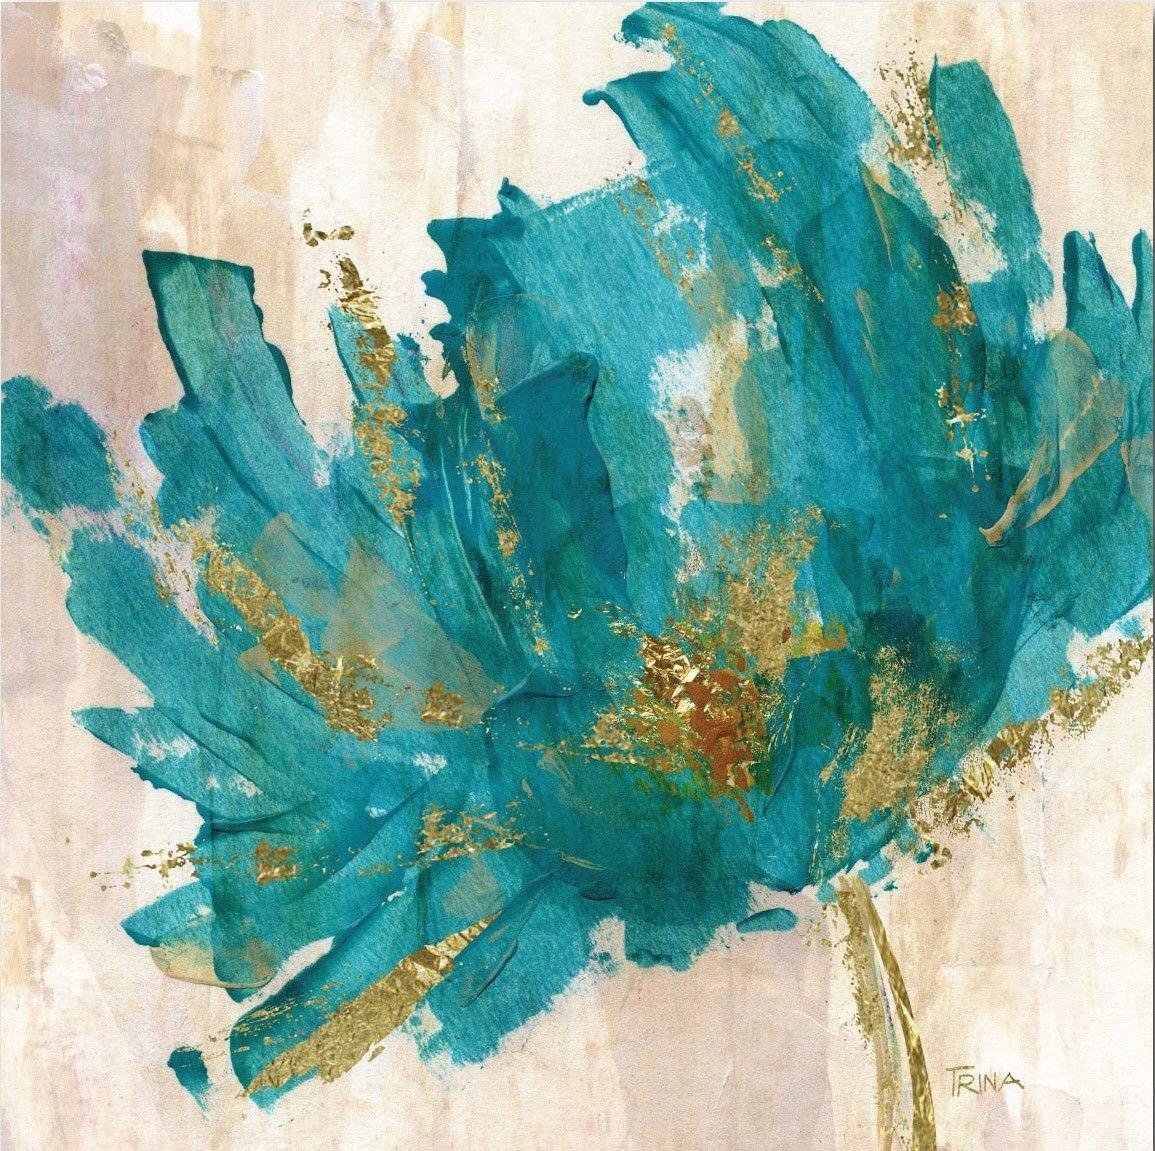 Joss And Main | Condo Decor Ideas & Inspiration | Pinterest In Joss And Main Wall Art (Image 13 of 20)